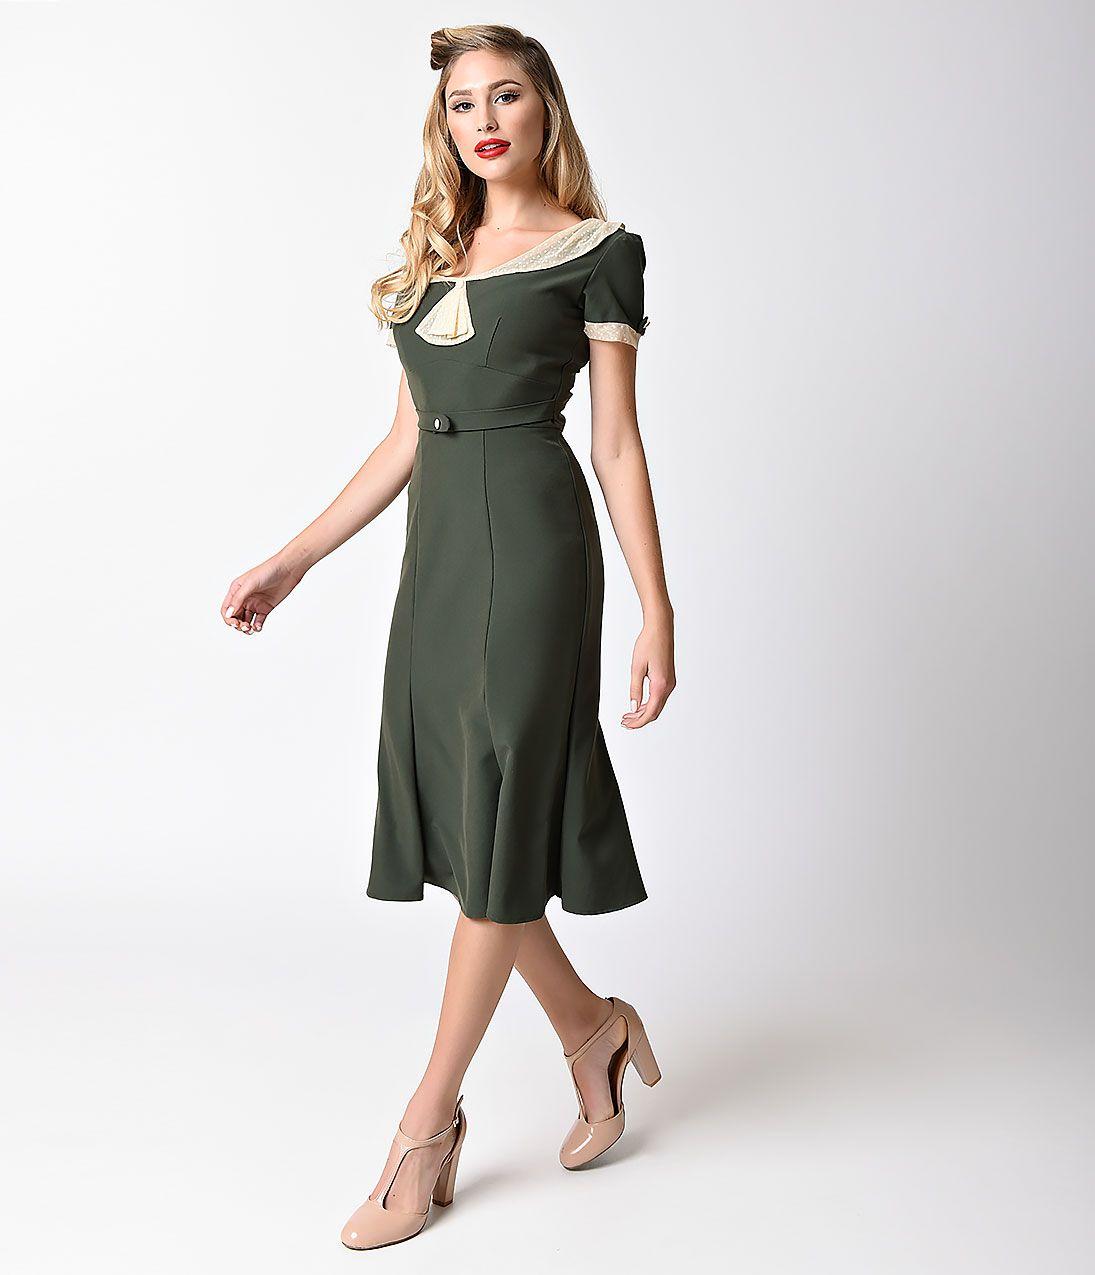 Pin On 1940s Fashion History